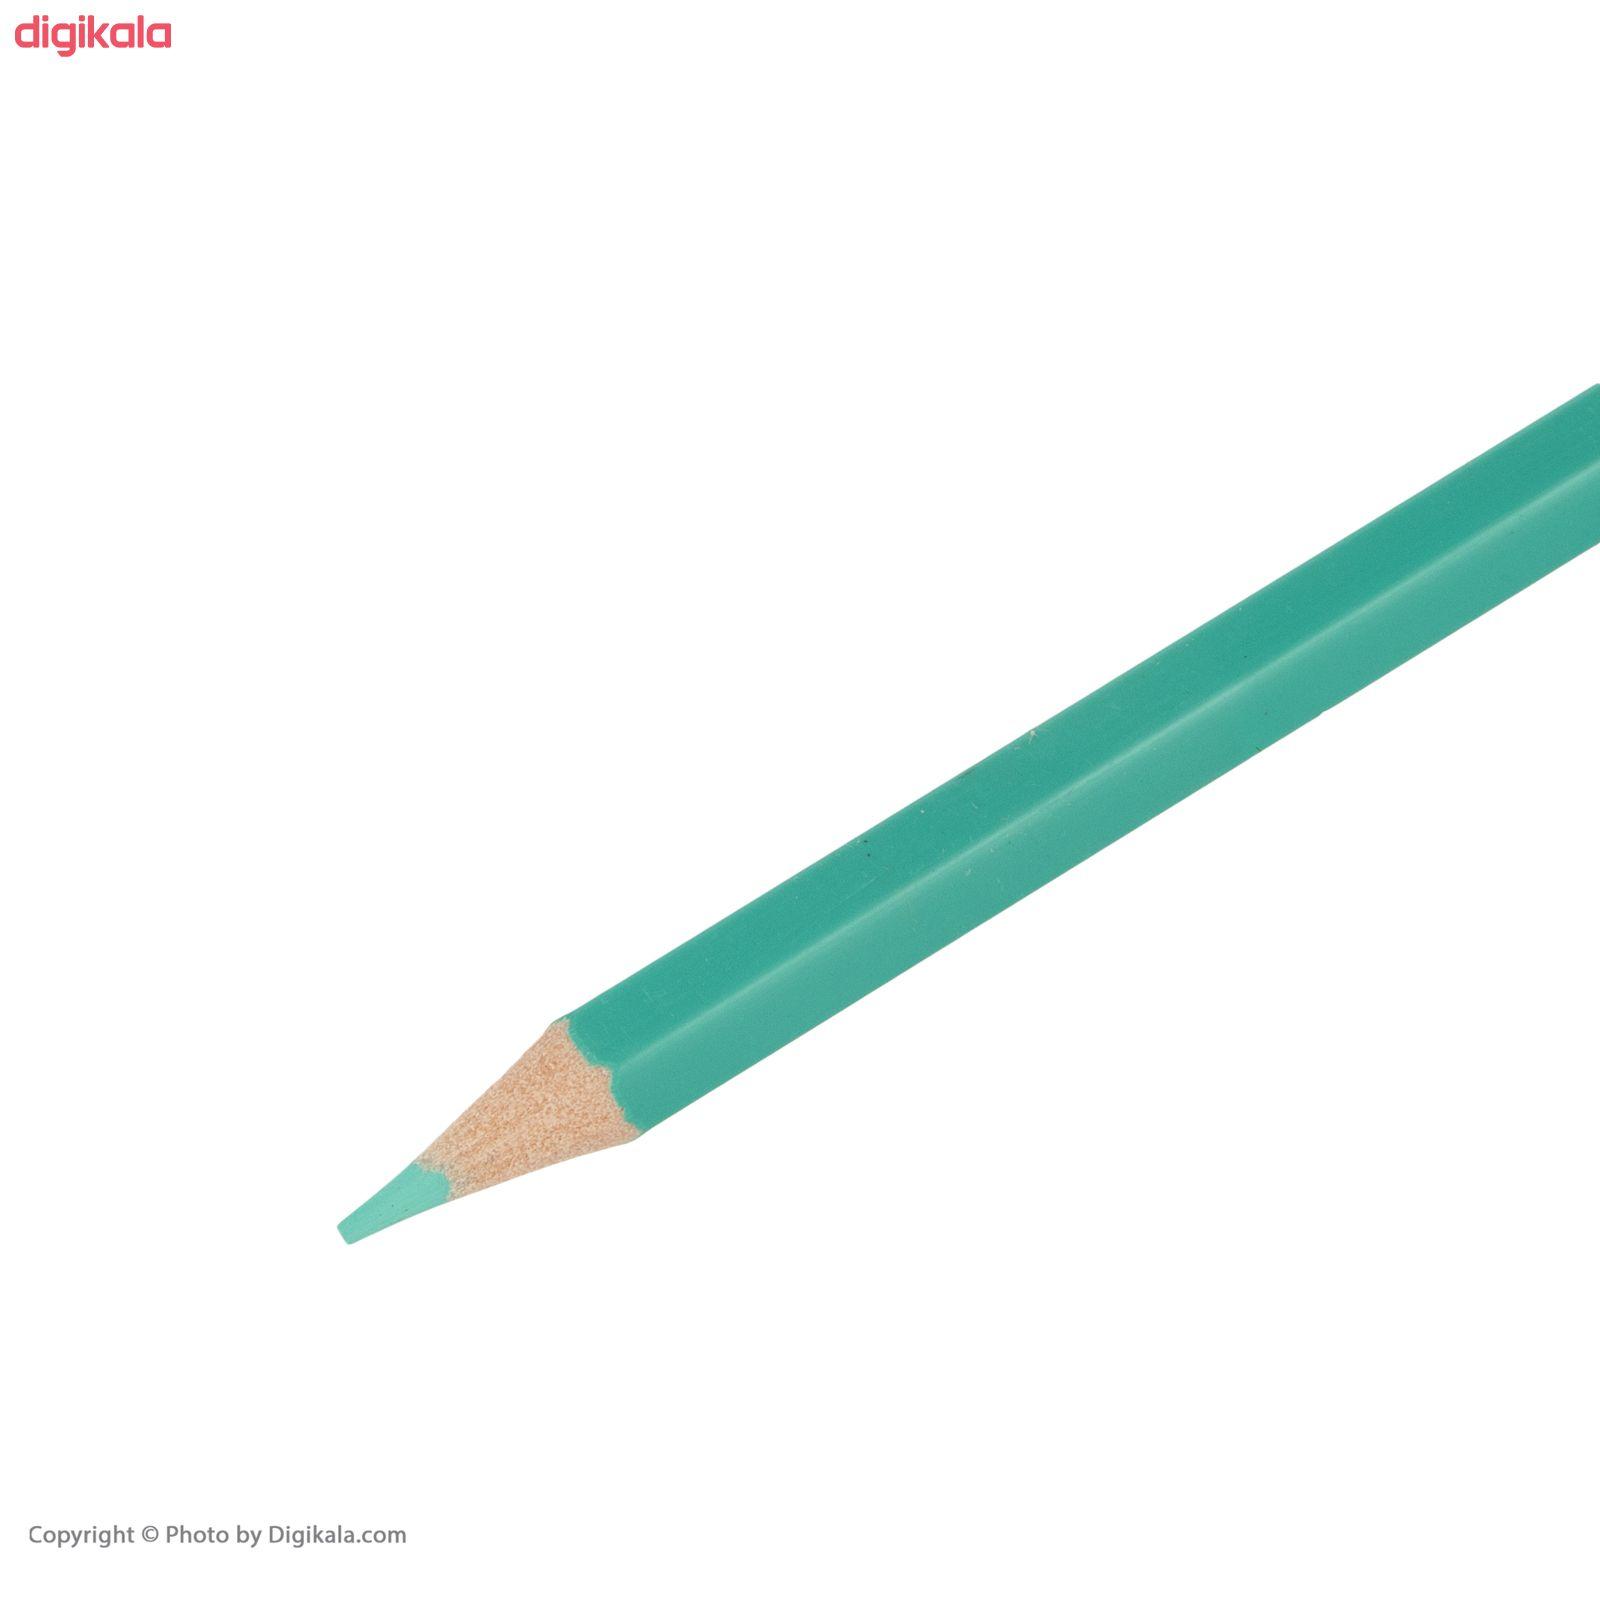 مداد رنگی 48 رنگ فنلوت مدل COLOR-48 main 1 13